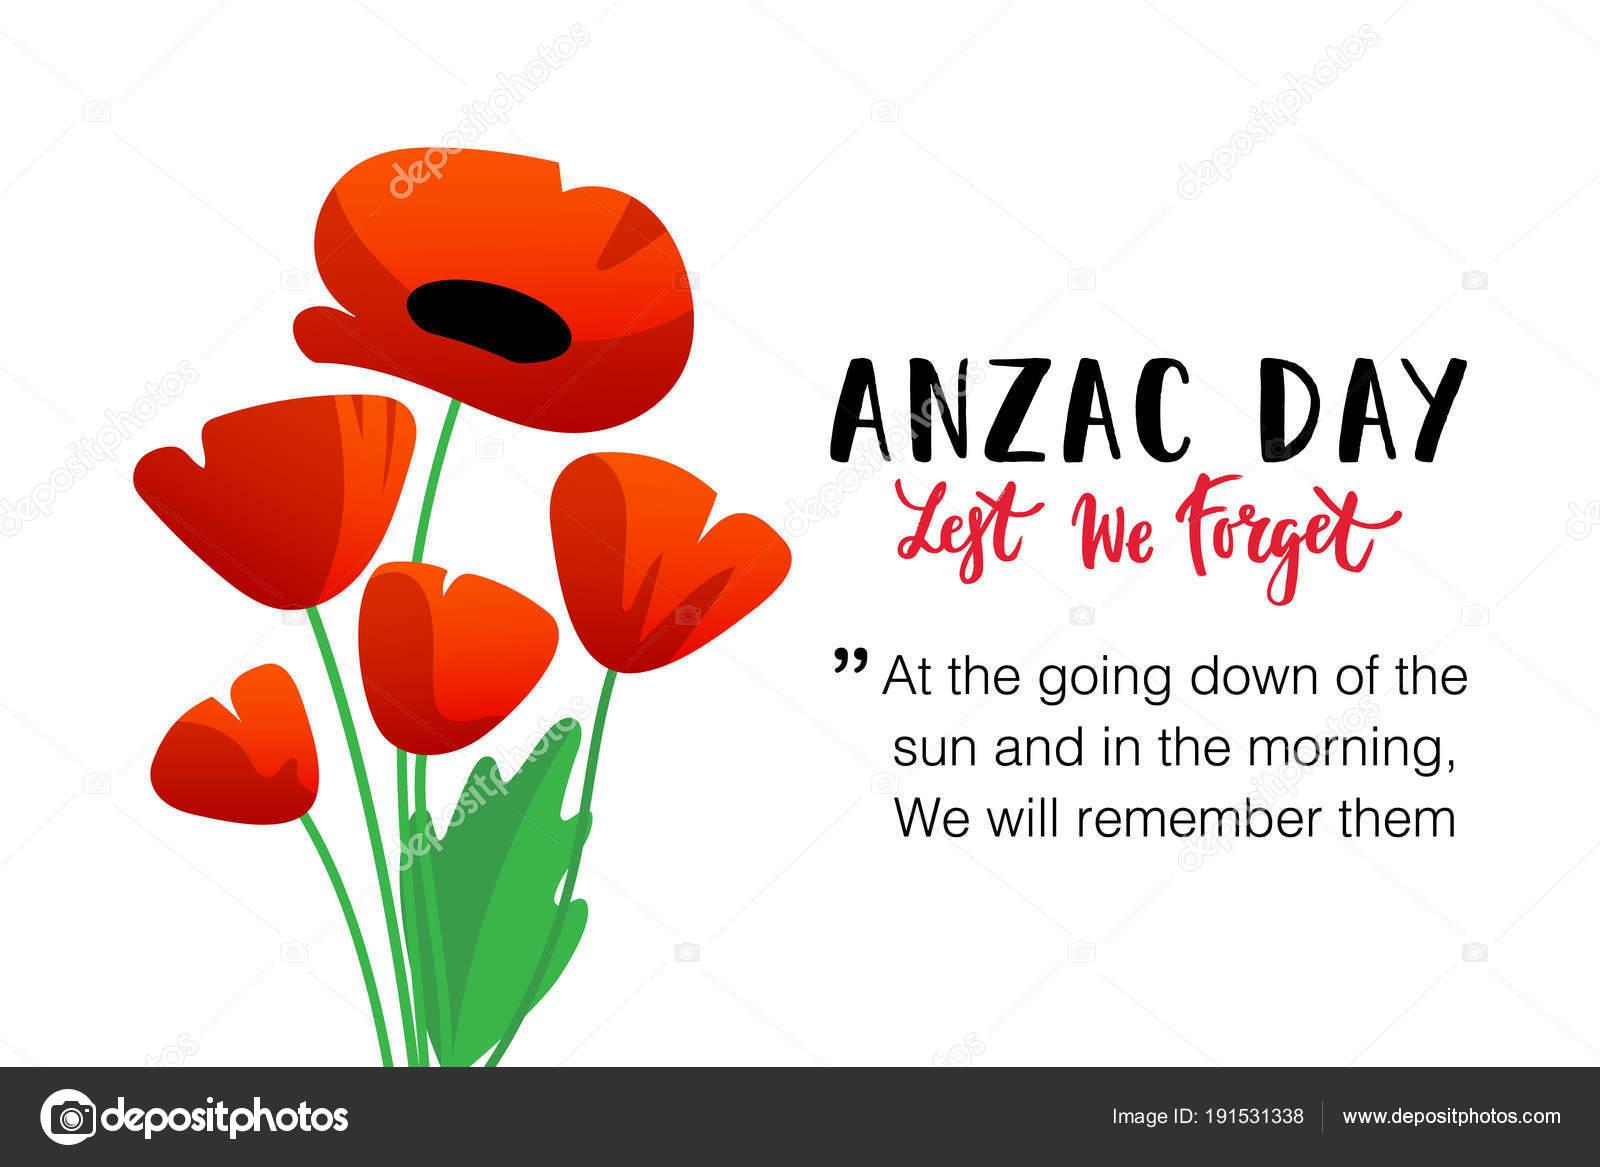 vector illustration bright poppy flower remembrance day symbol lest